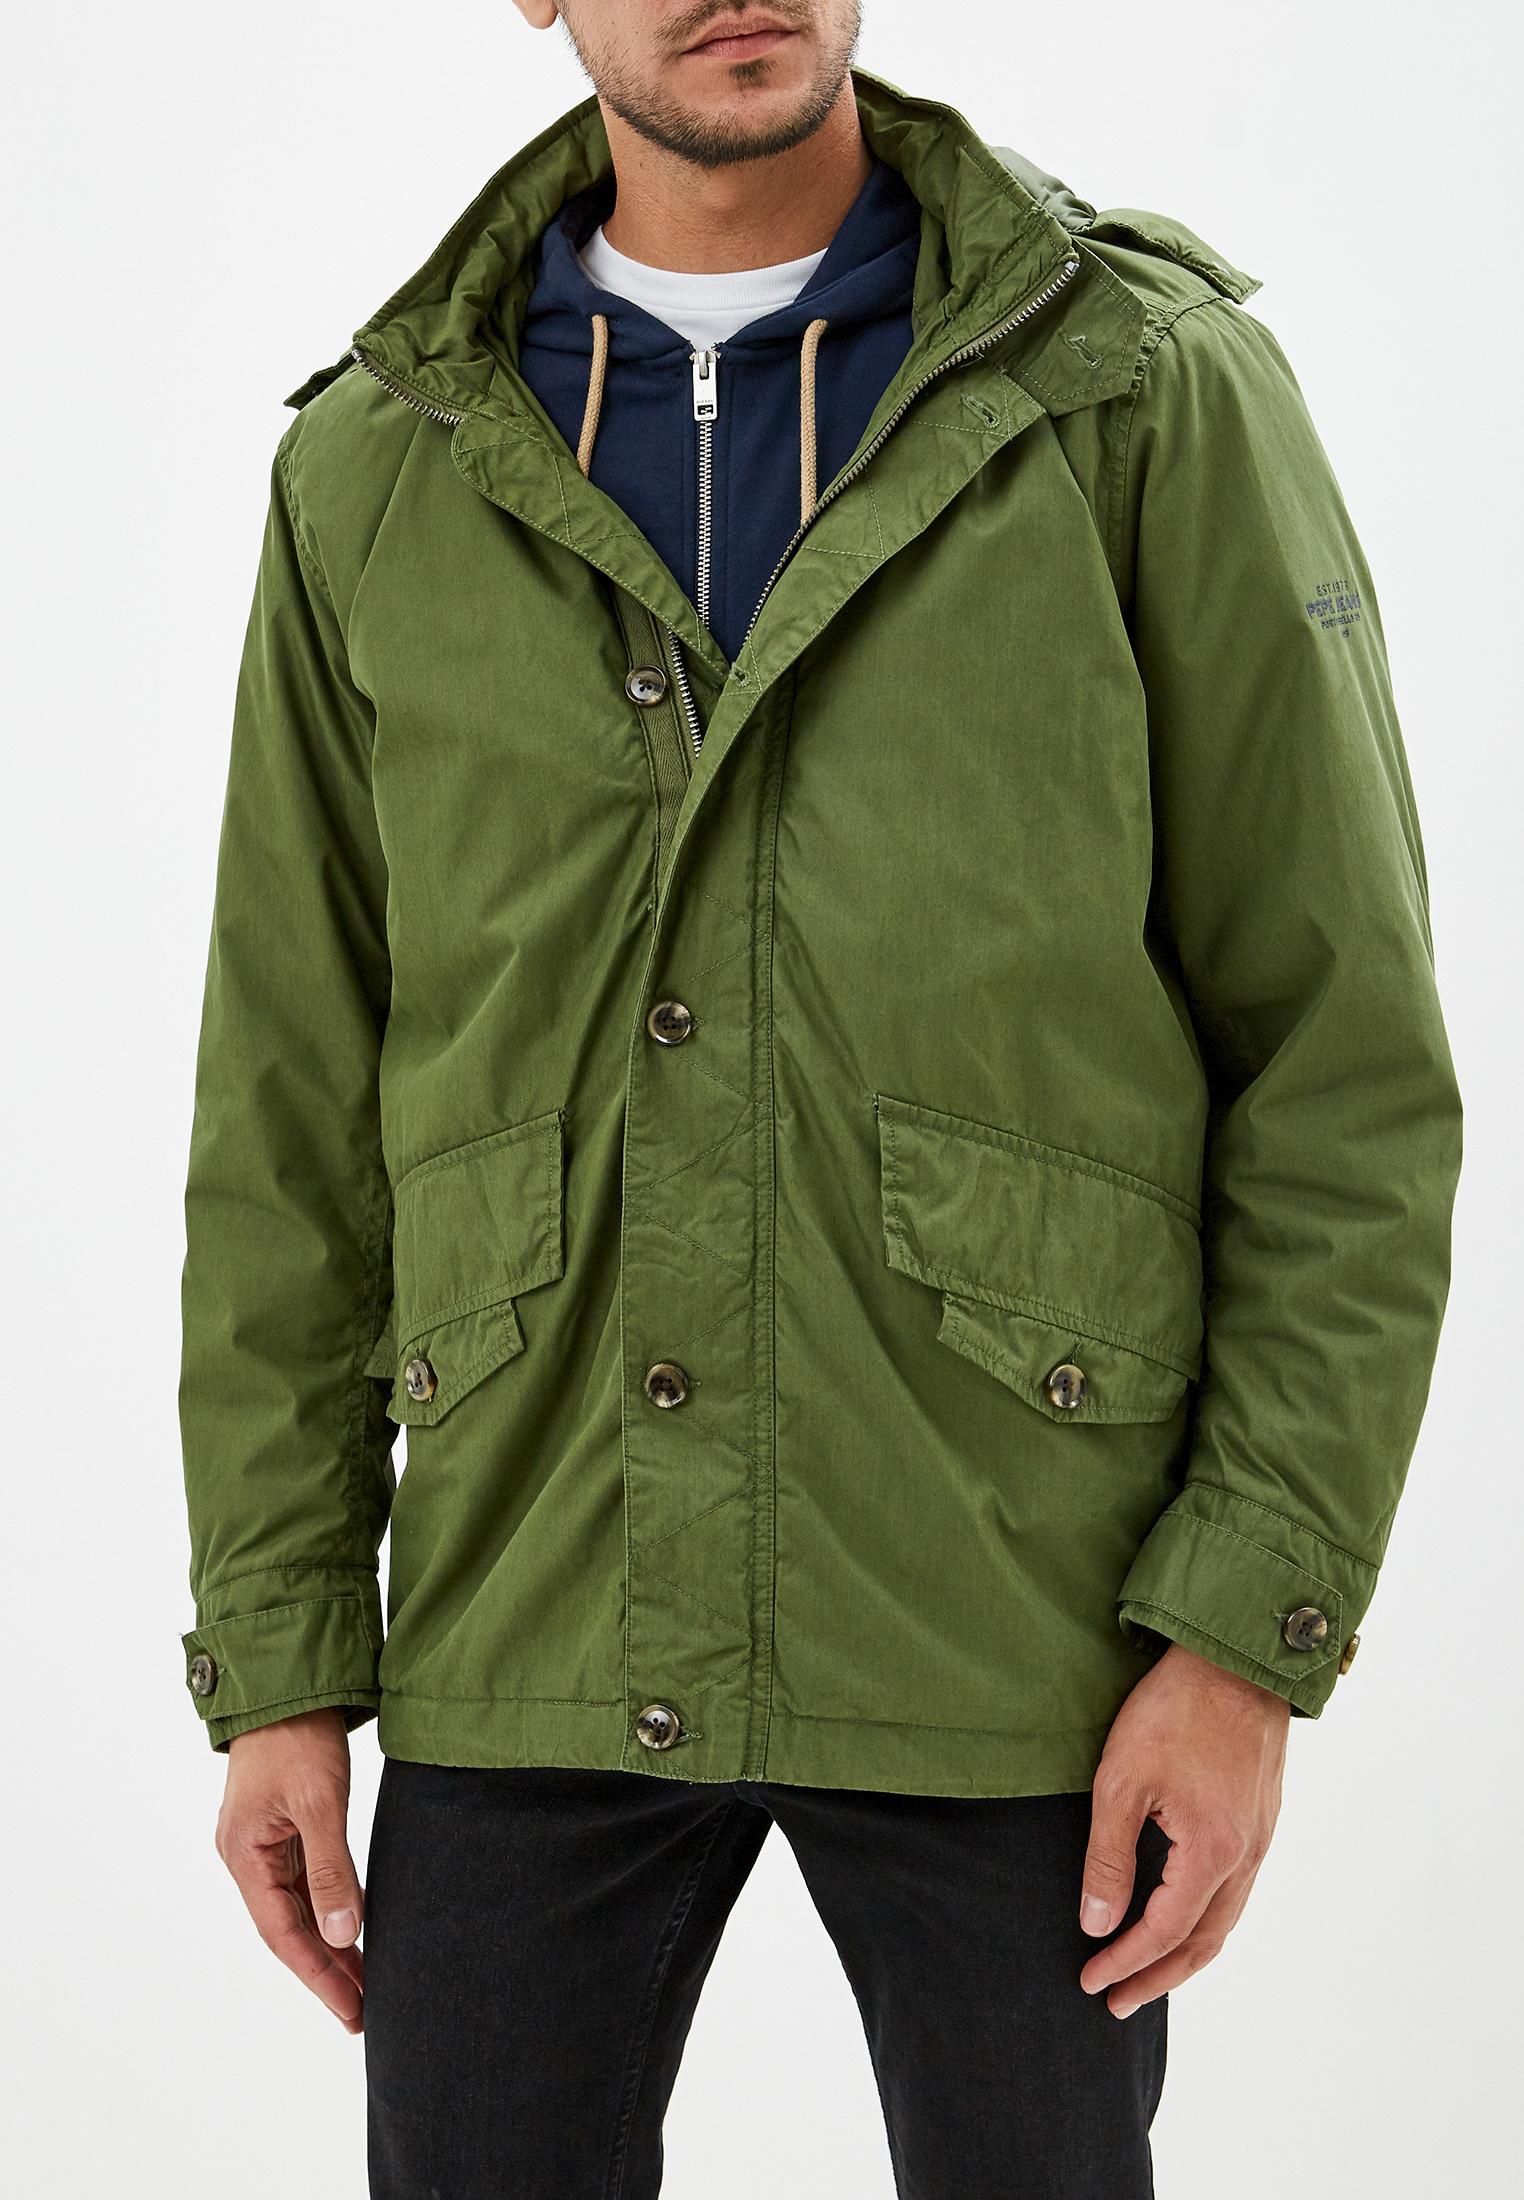 Утепленная куртка Pepe Jeans (Пепе Джинс) PM402097